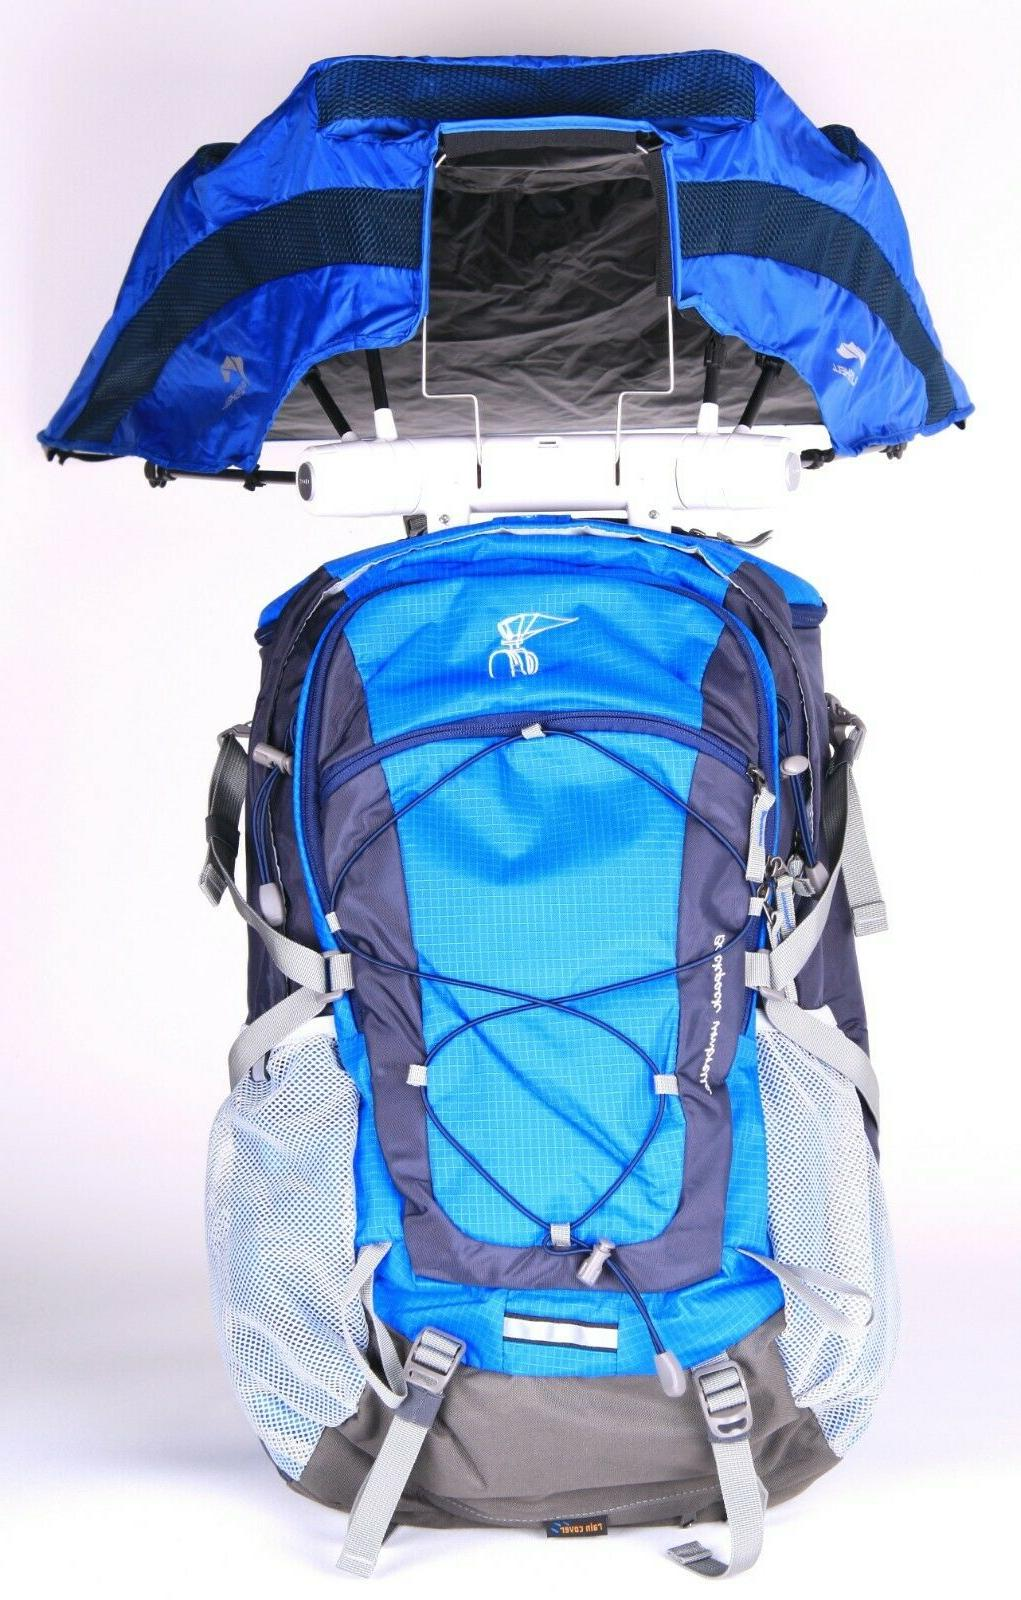 FunShell 40L Umbrella, Camping UV Protection w/